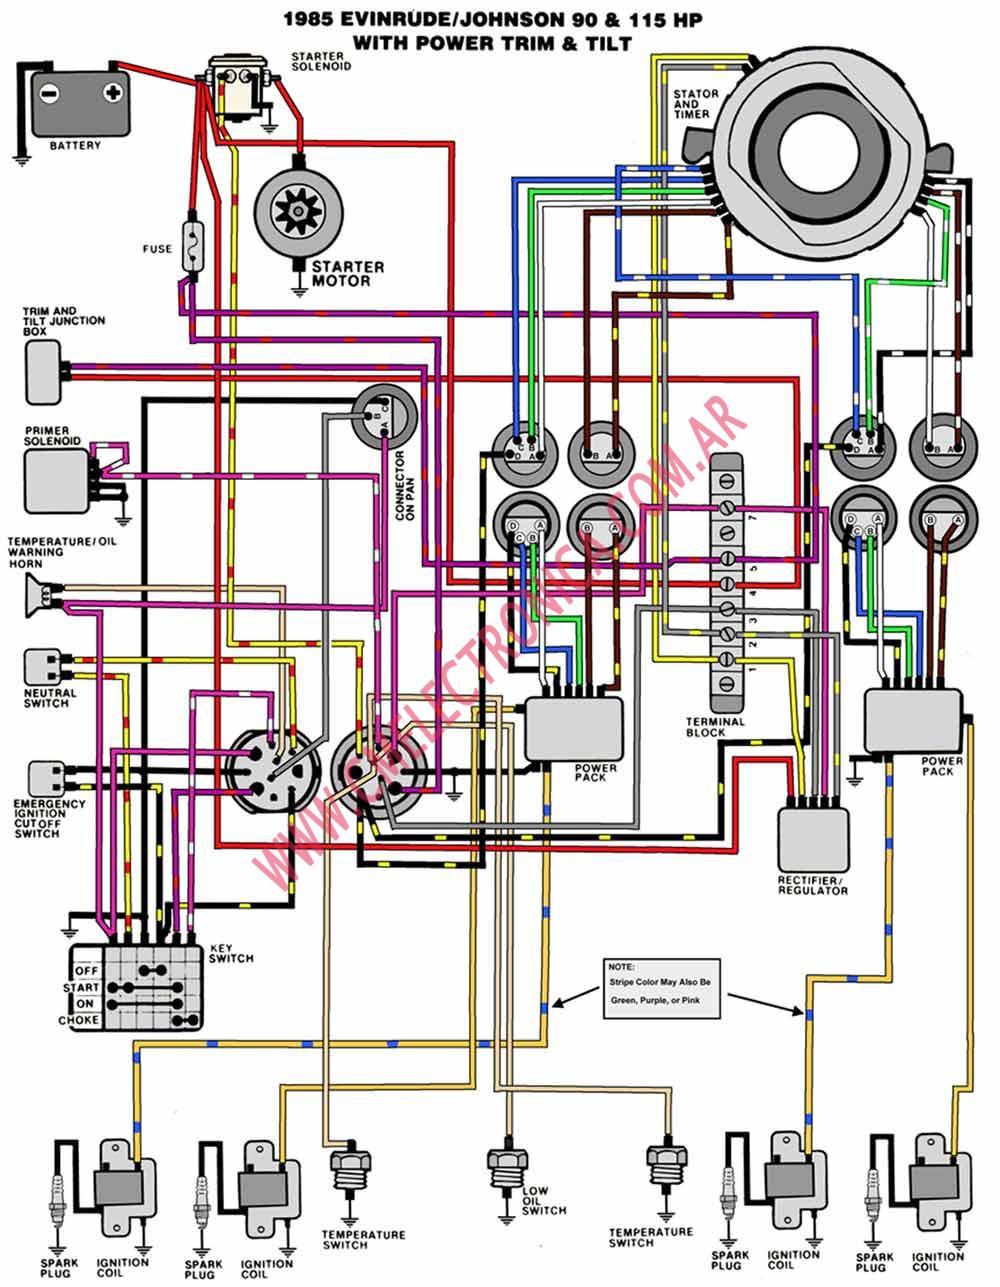 hight resolution of wrg 4423 evinrude 115 wiring diagram evinrude outboard motor wiring diagram diagrama evinrude johnson 1985